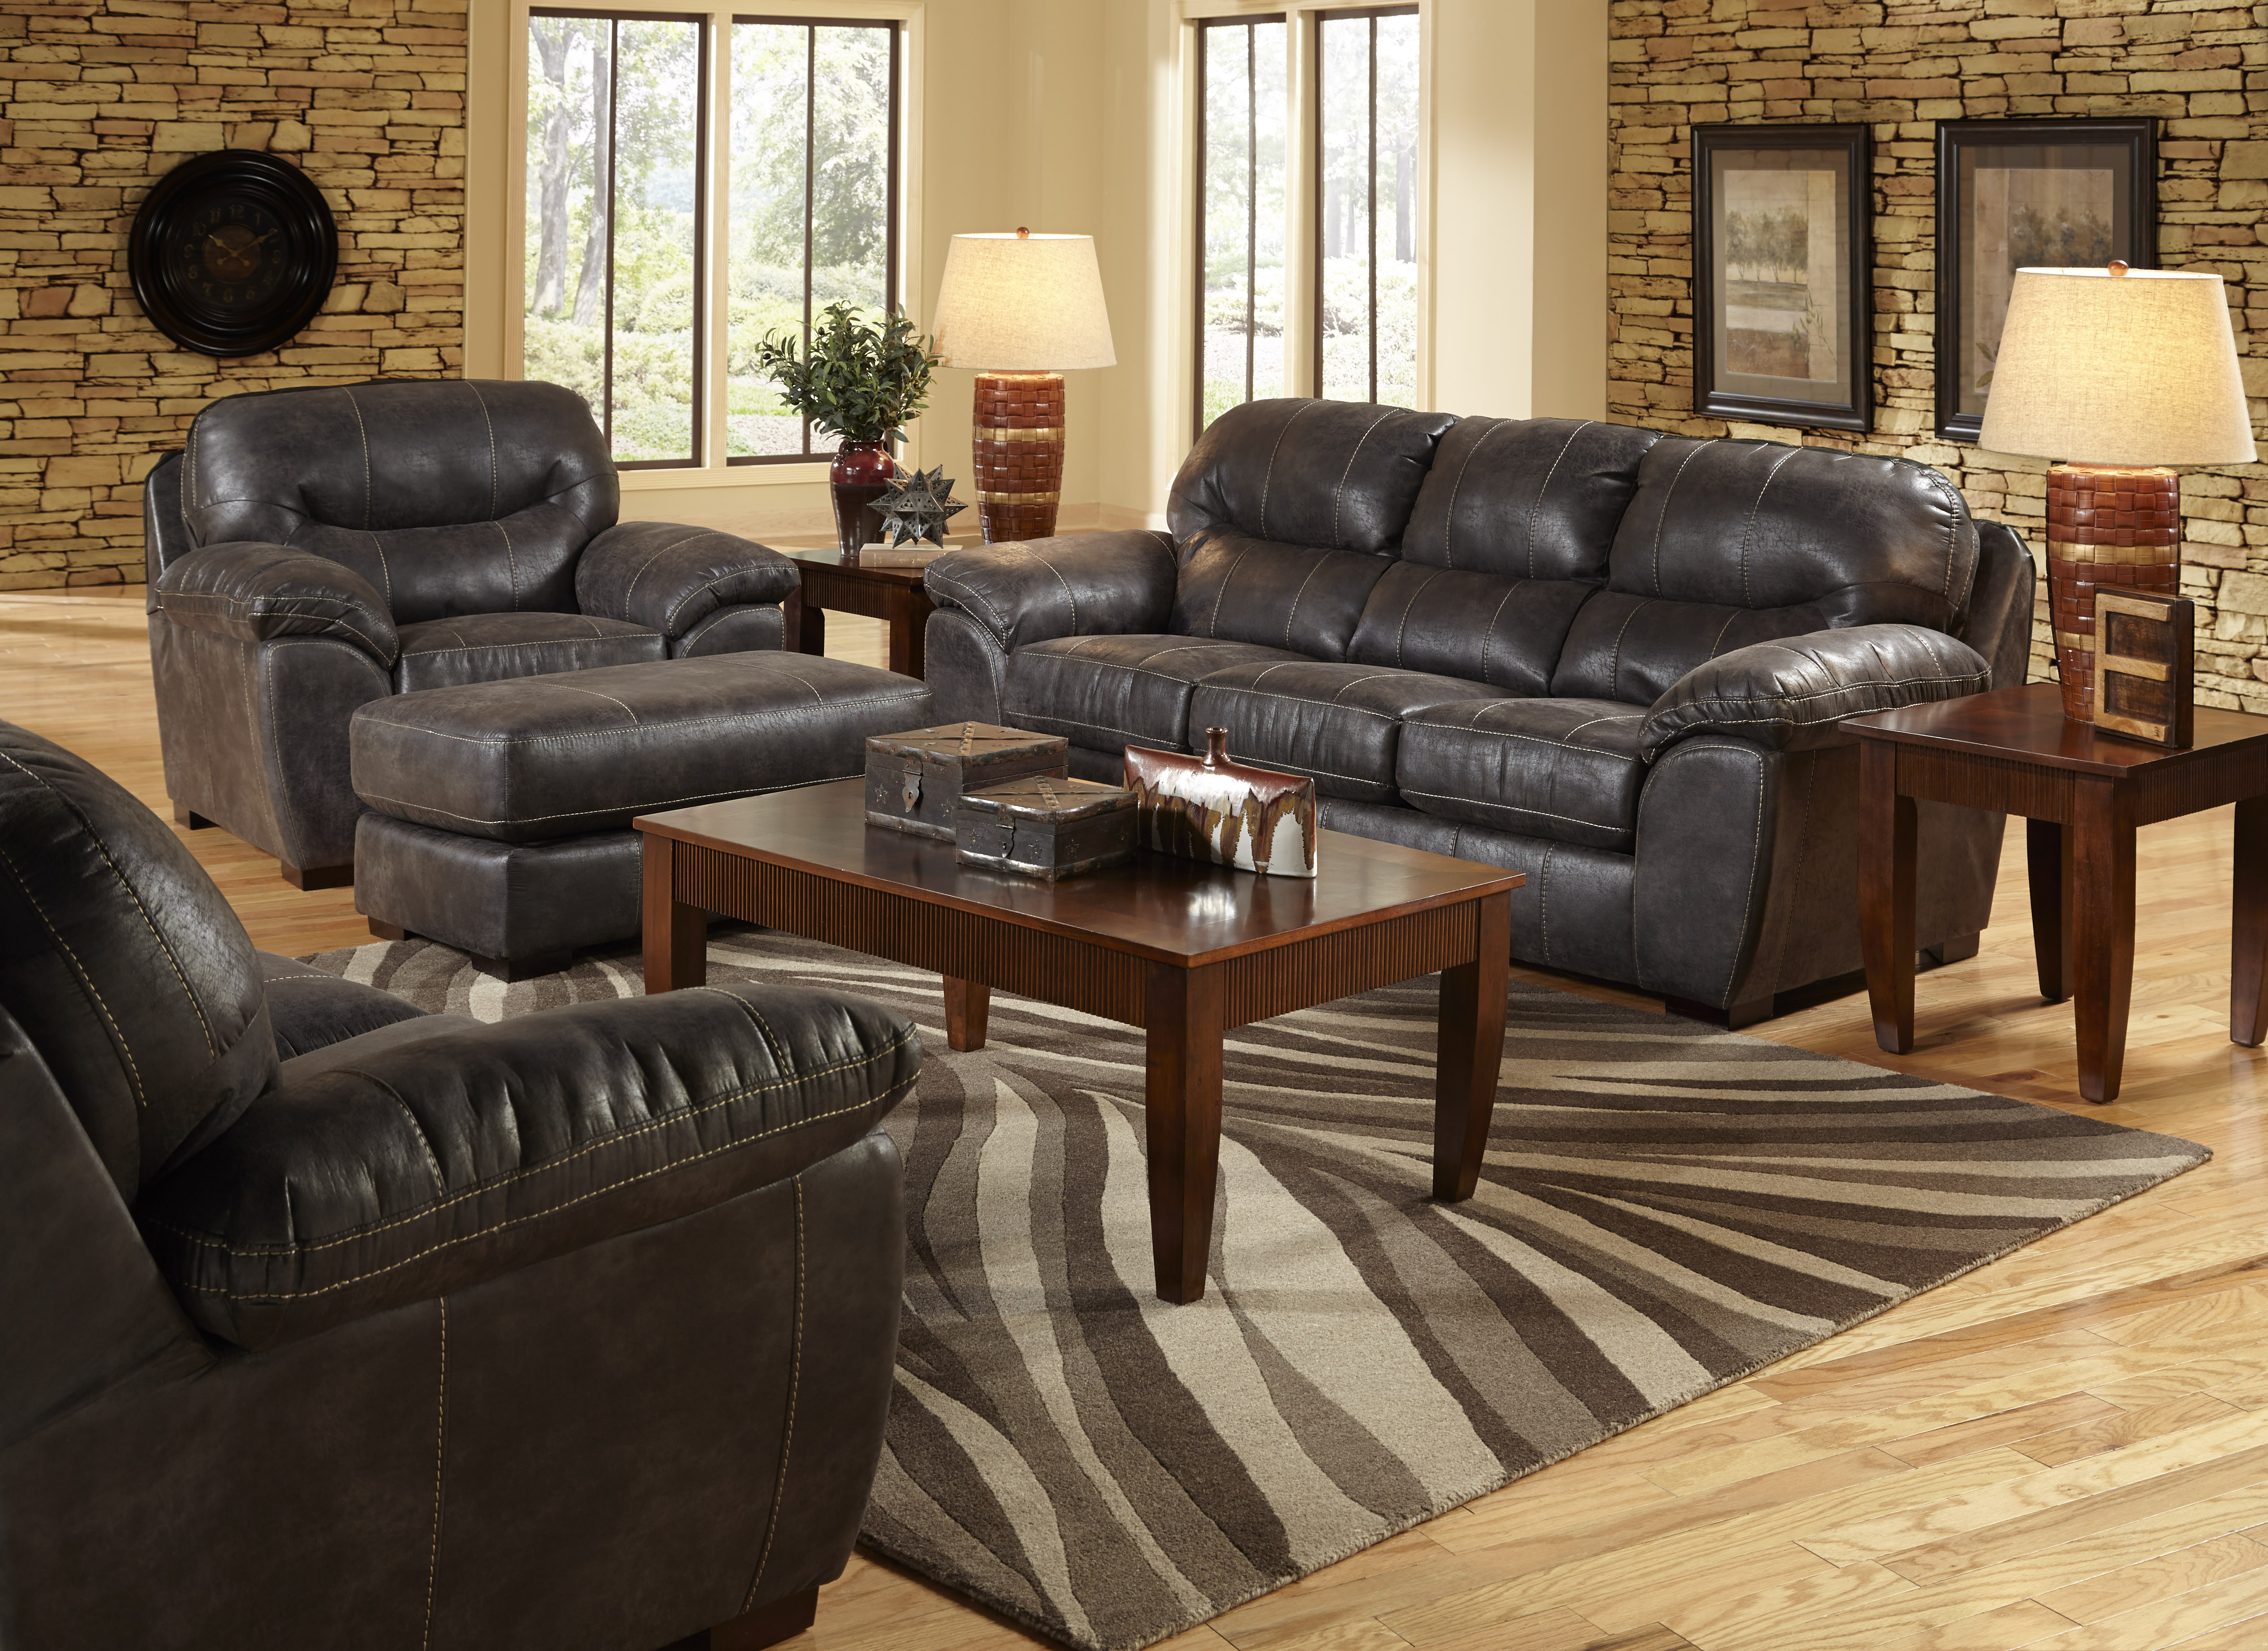 Great Grant 4453 Bonded Leather Sofa Collection. Jackson Furnitureu0027s ...